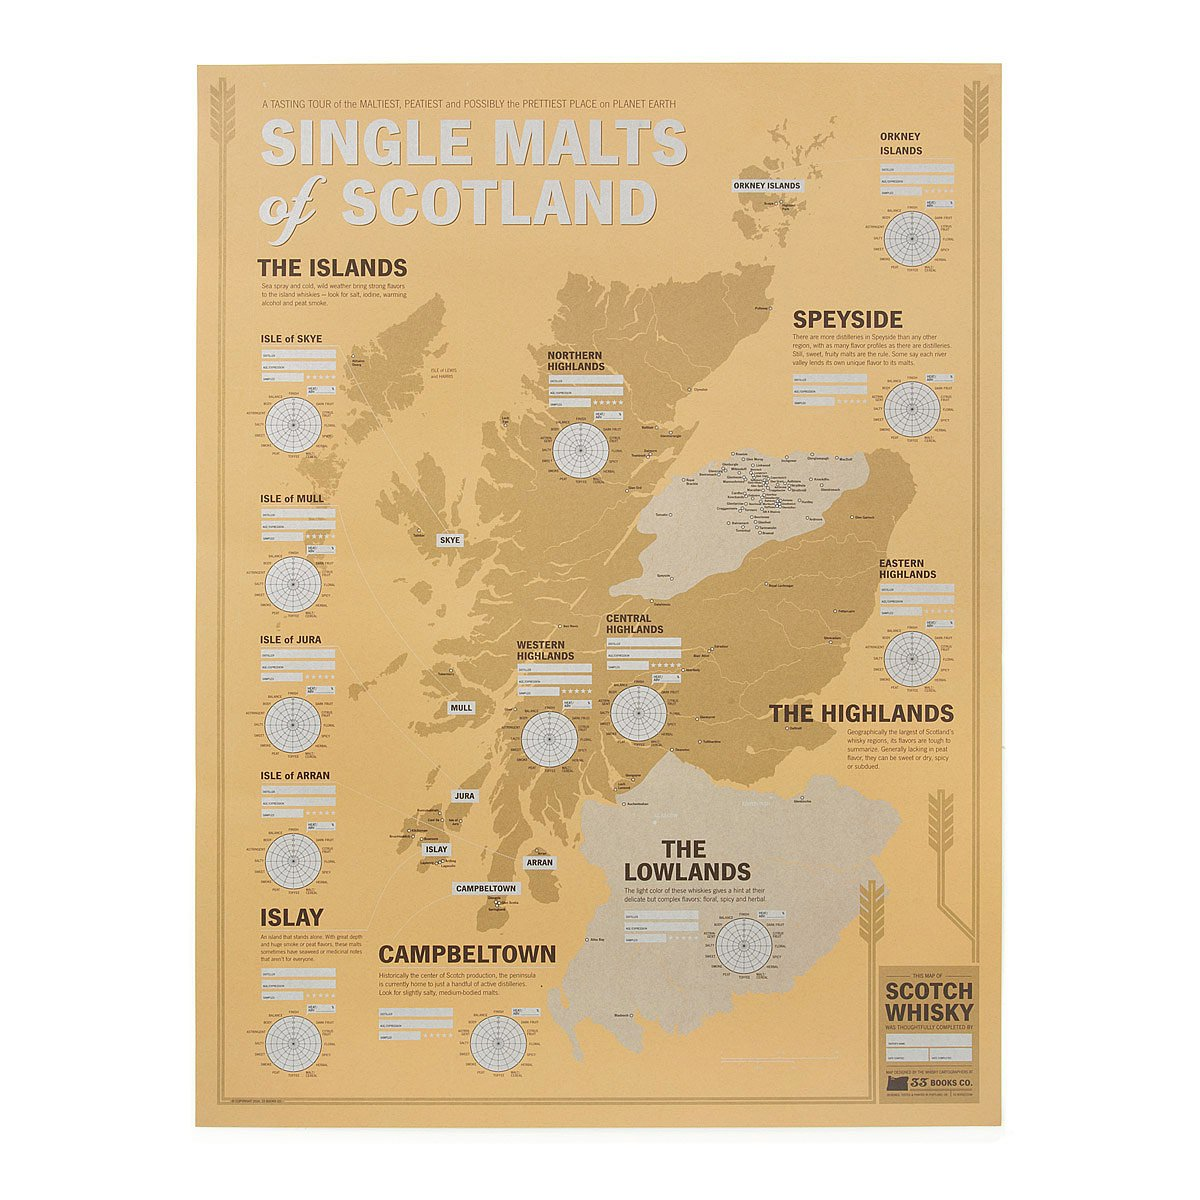 Single Malts of Scotland Tasting Map  Scotch tasting interactive